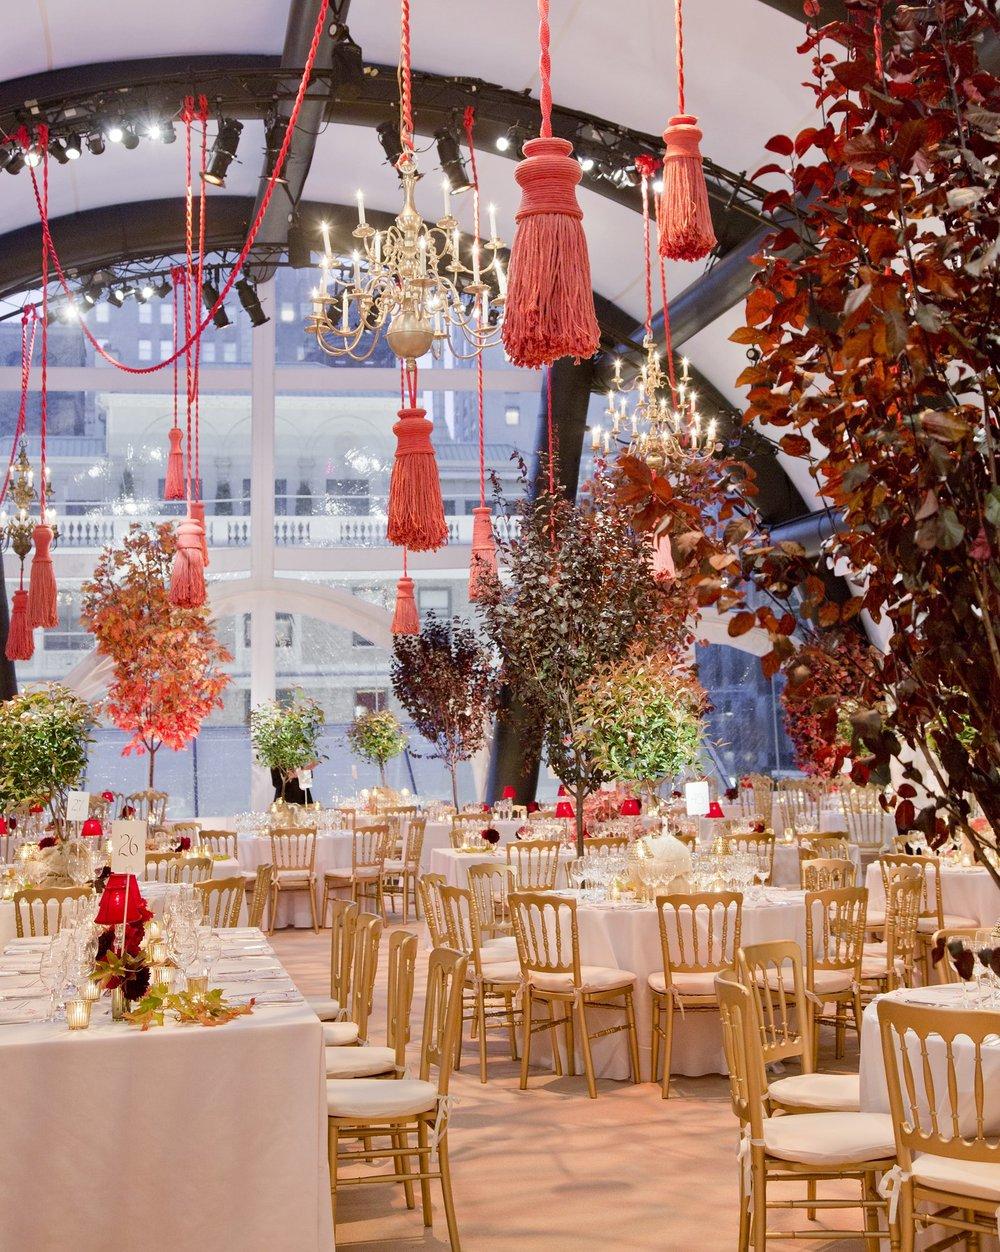 Carnegie Hall 125th Annversary Gala